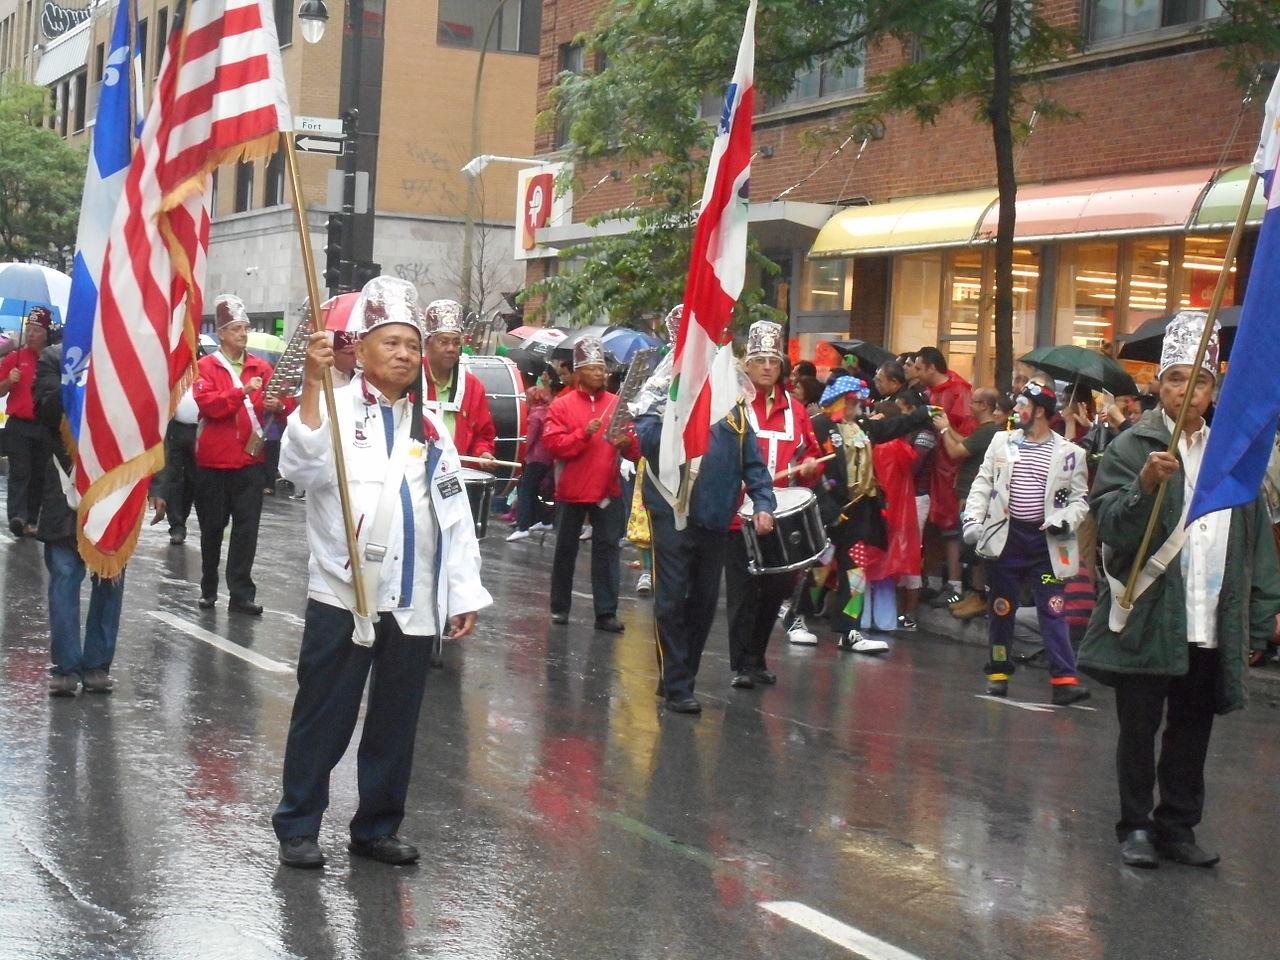 File:Canada Day 2015 on Saint Catherine Street - 132.jpg - Wikimedia